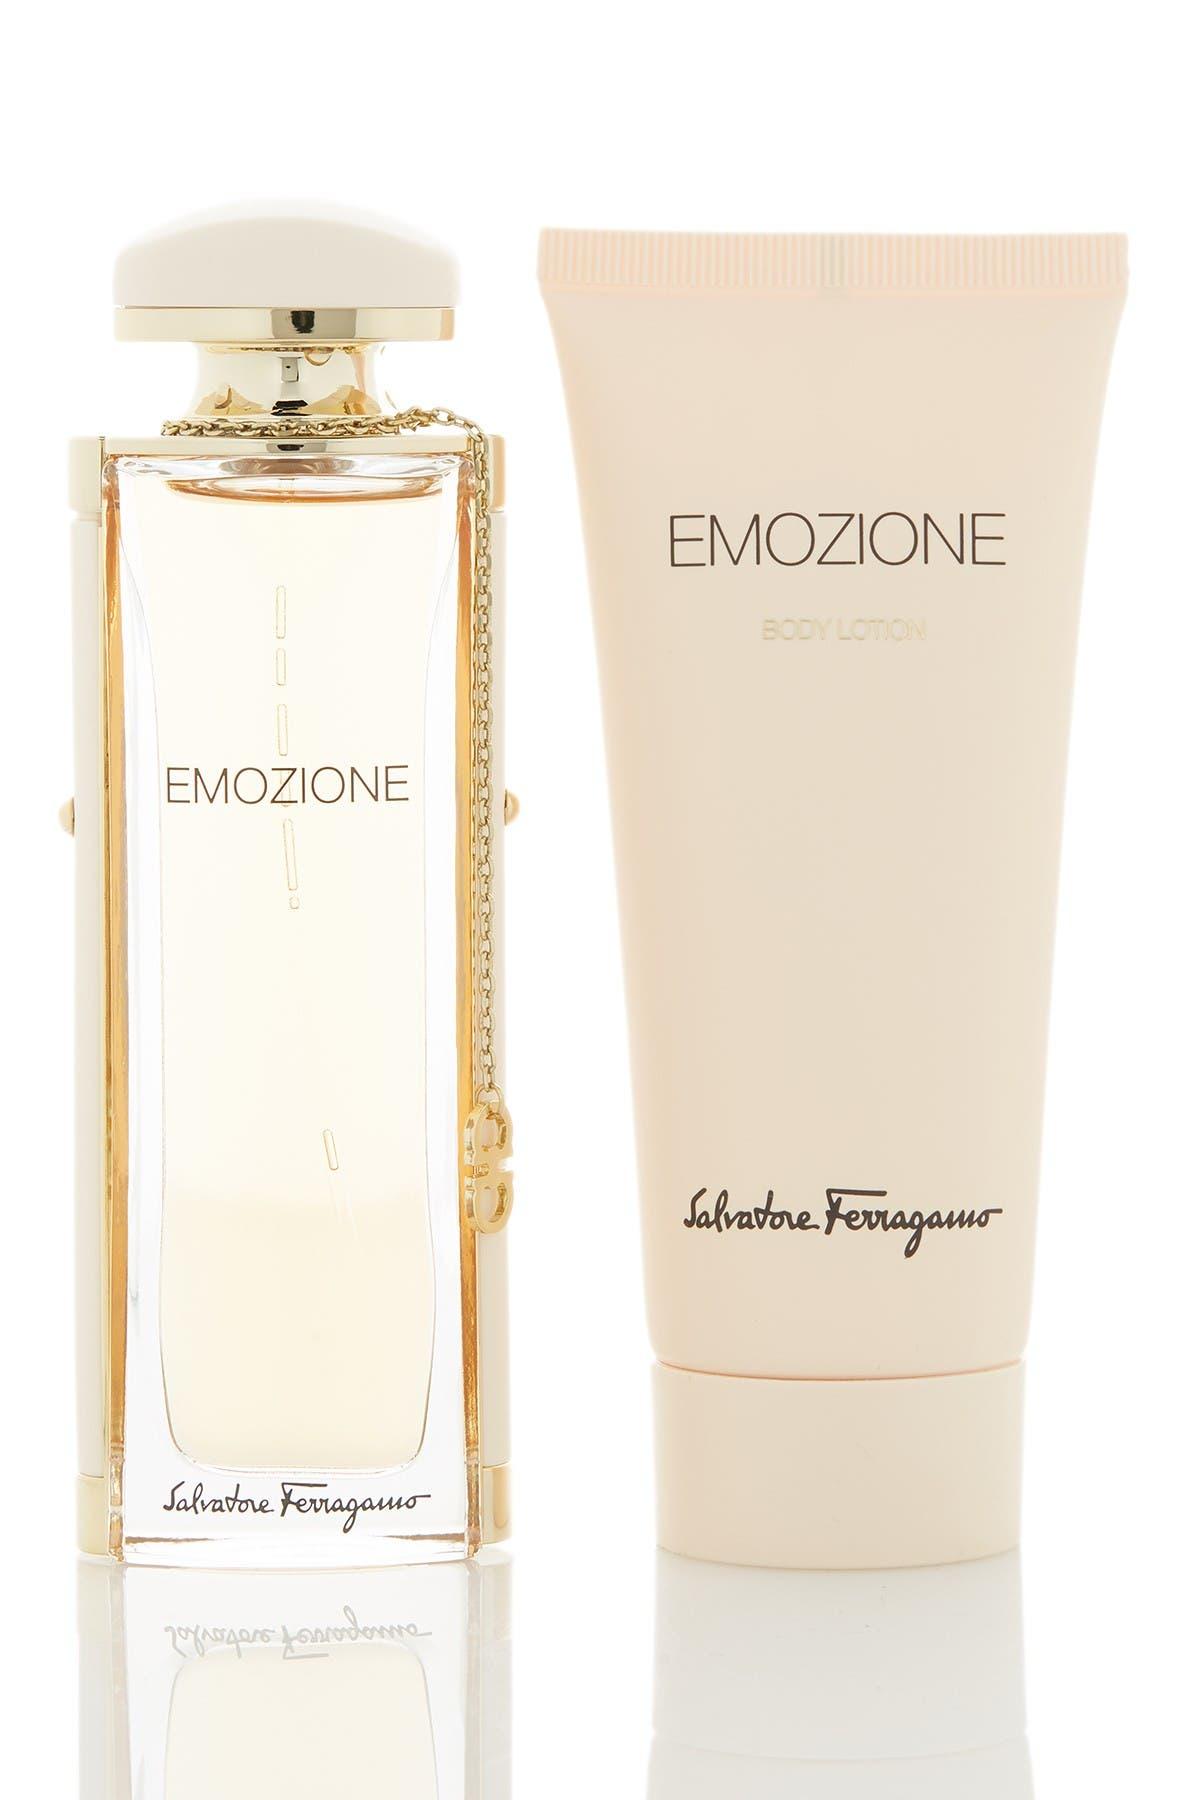 Image of Salvatore Ferragamo Emozione 2-Piece Eau de Parfum & Body Lotion Set